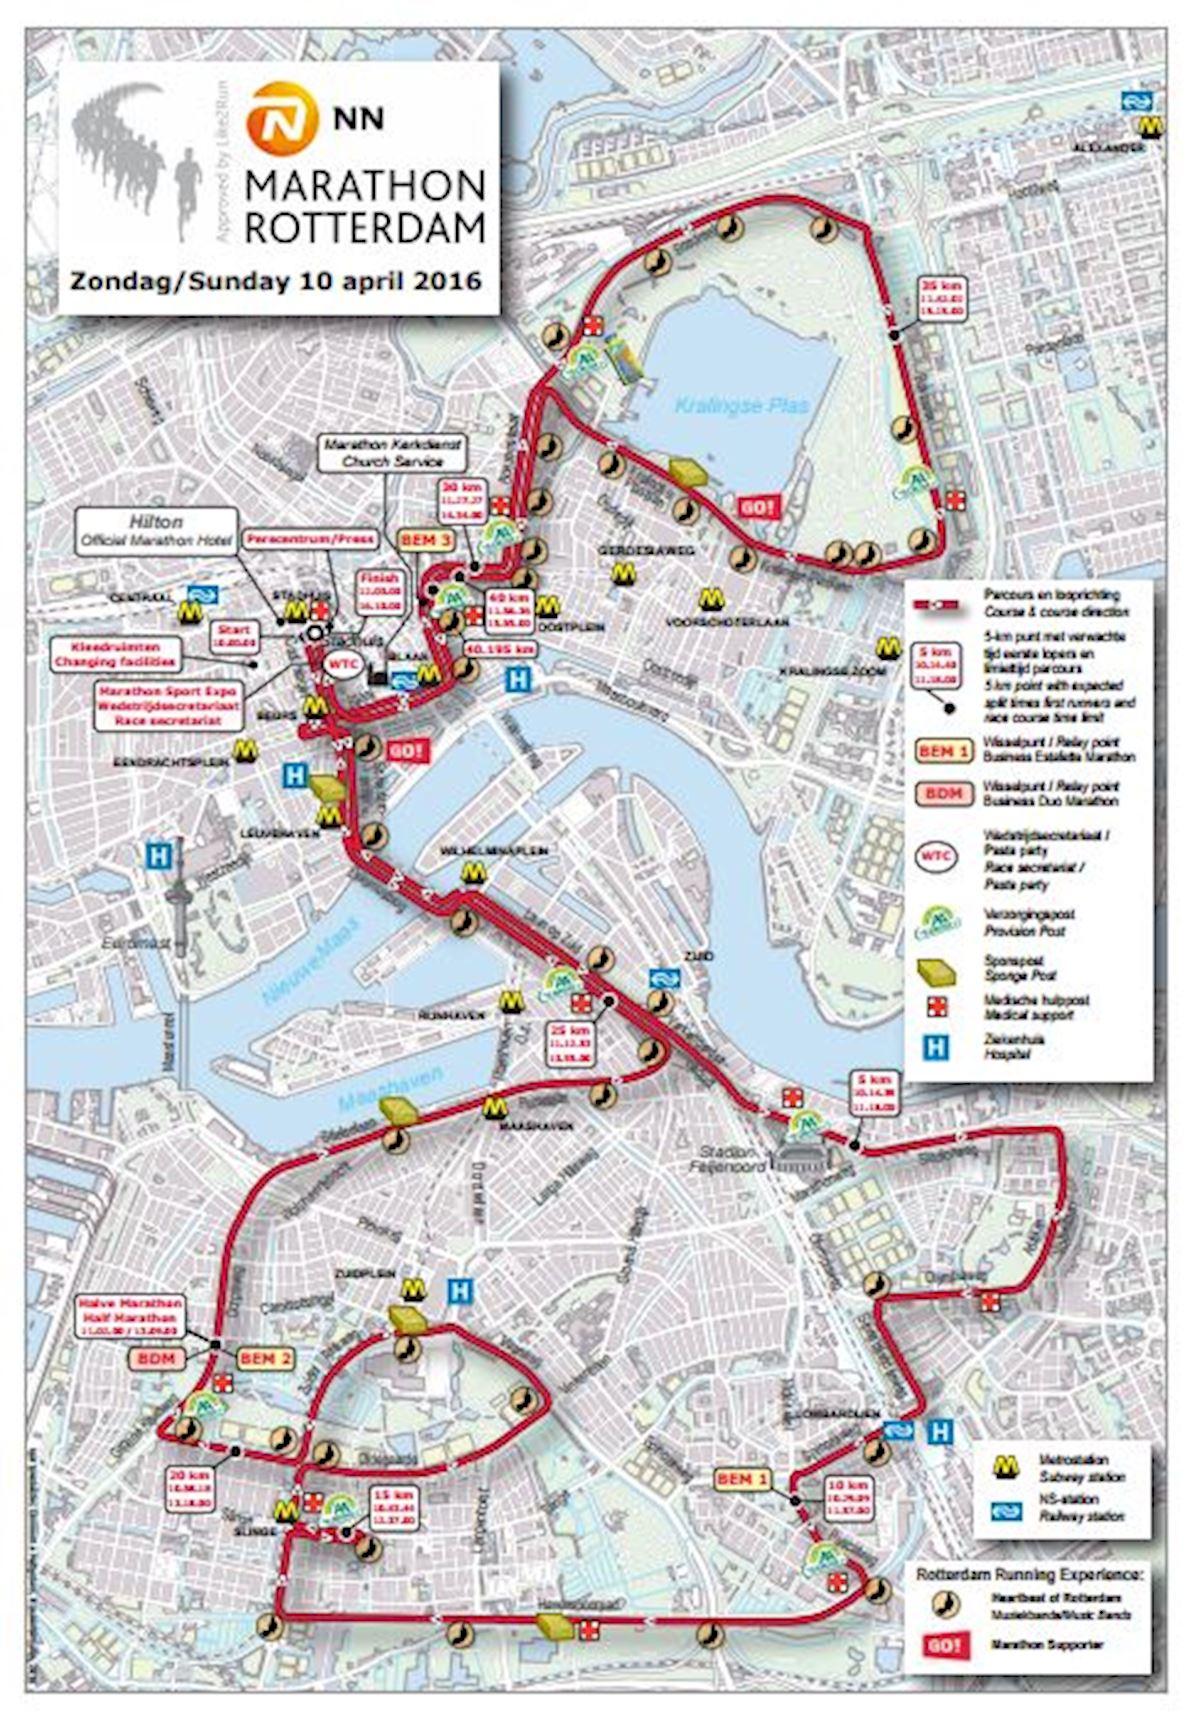 NN Marathon Rotterdam Route Map